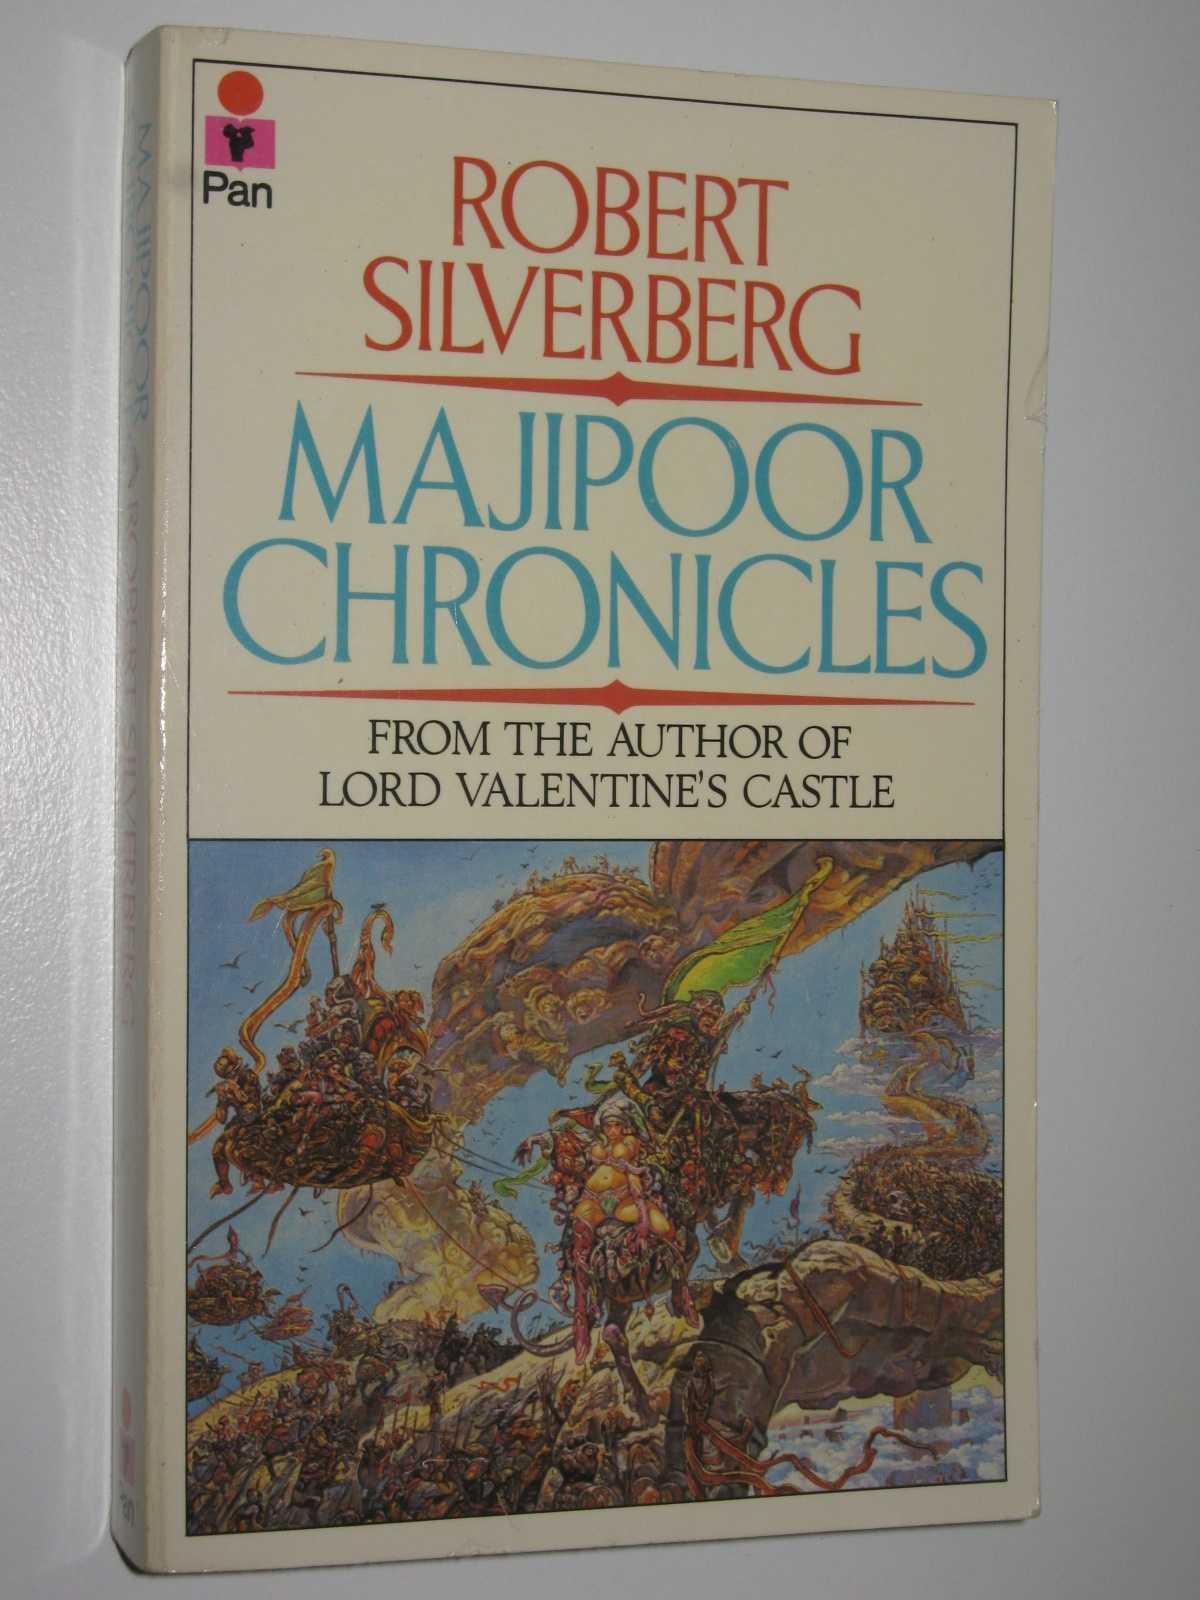 Majipoor Chronicles, Silverberg, Robert